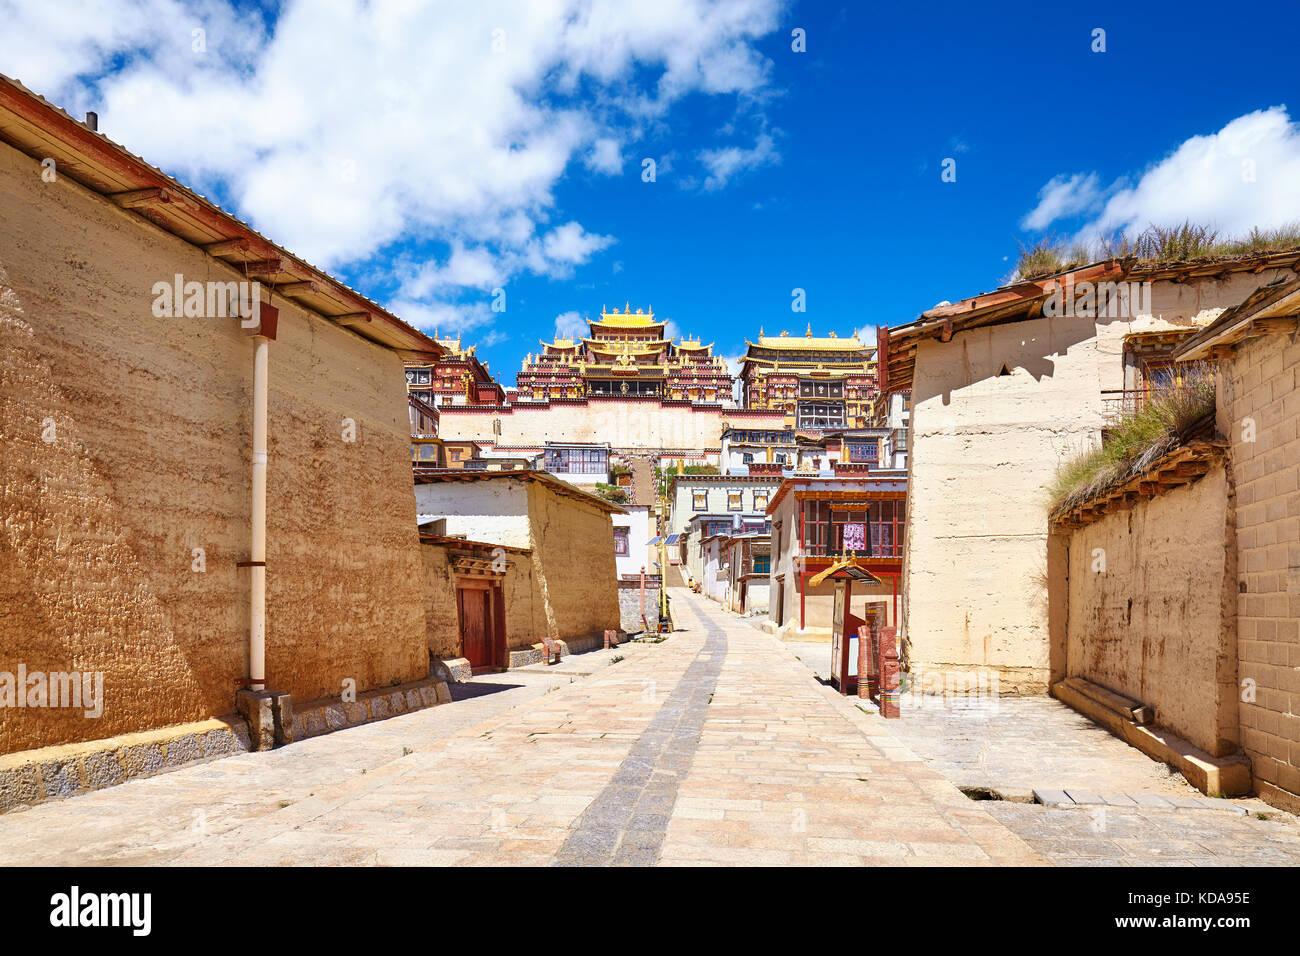 Straße in songzanlin Kloster, auch als sungtseling, ganden sumtsenling oder kleine Potala Palast, Yunnan, China Stockbild